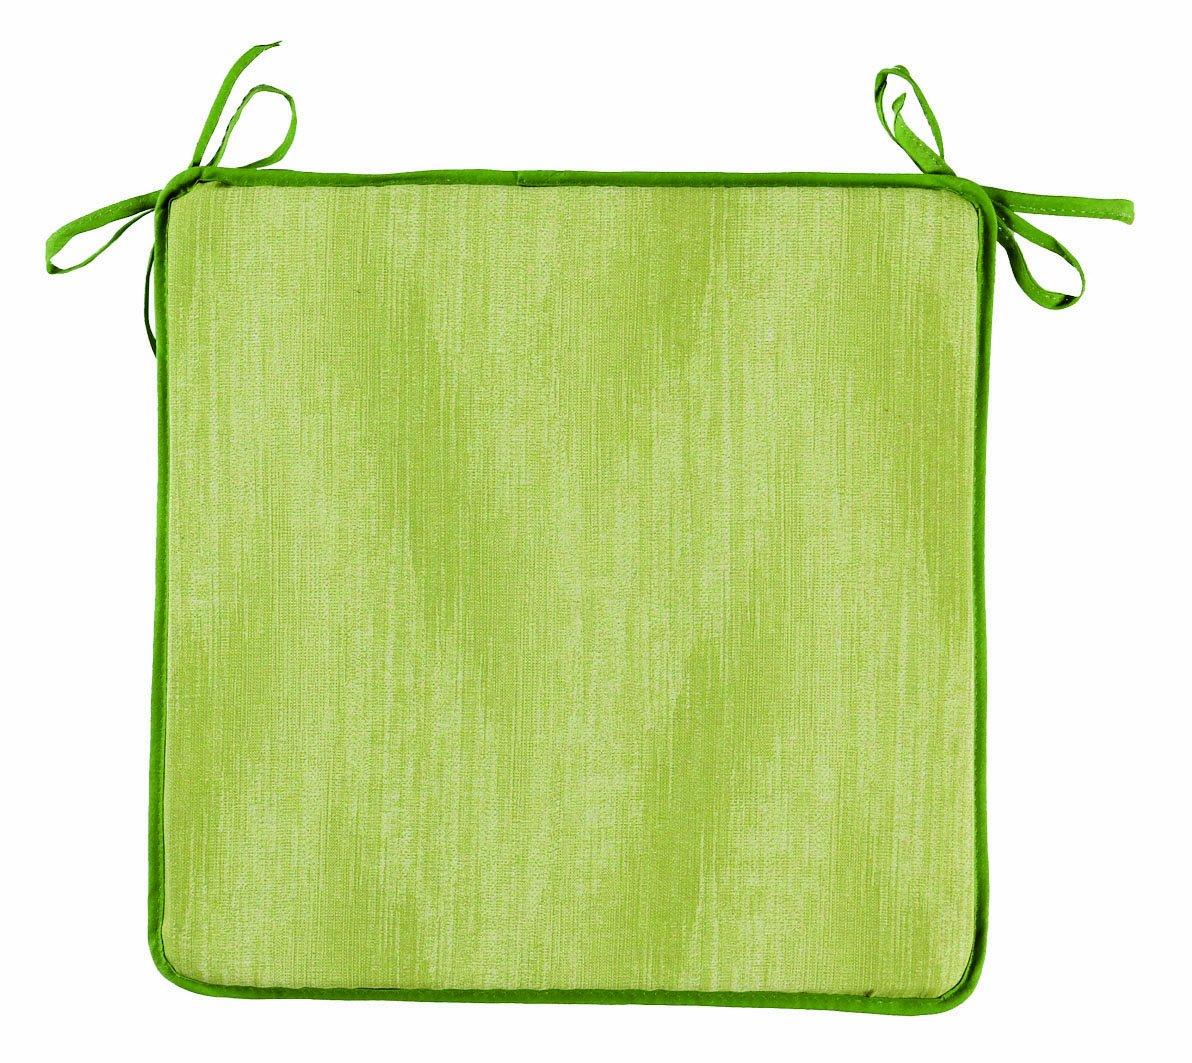 Best 04411477 disabili Cuscino Esterno 40 x 40 x 3 cm di Colore Verde